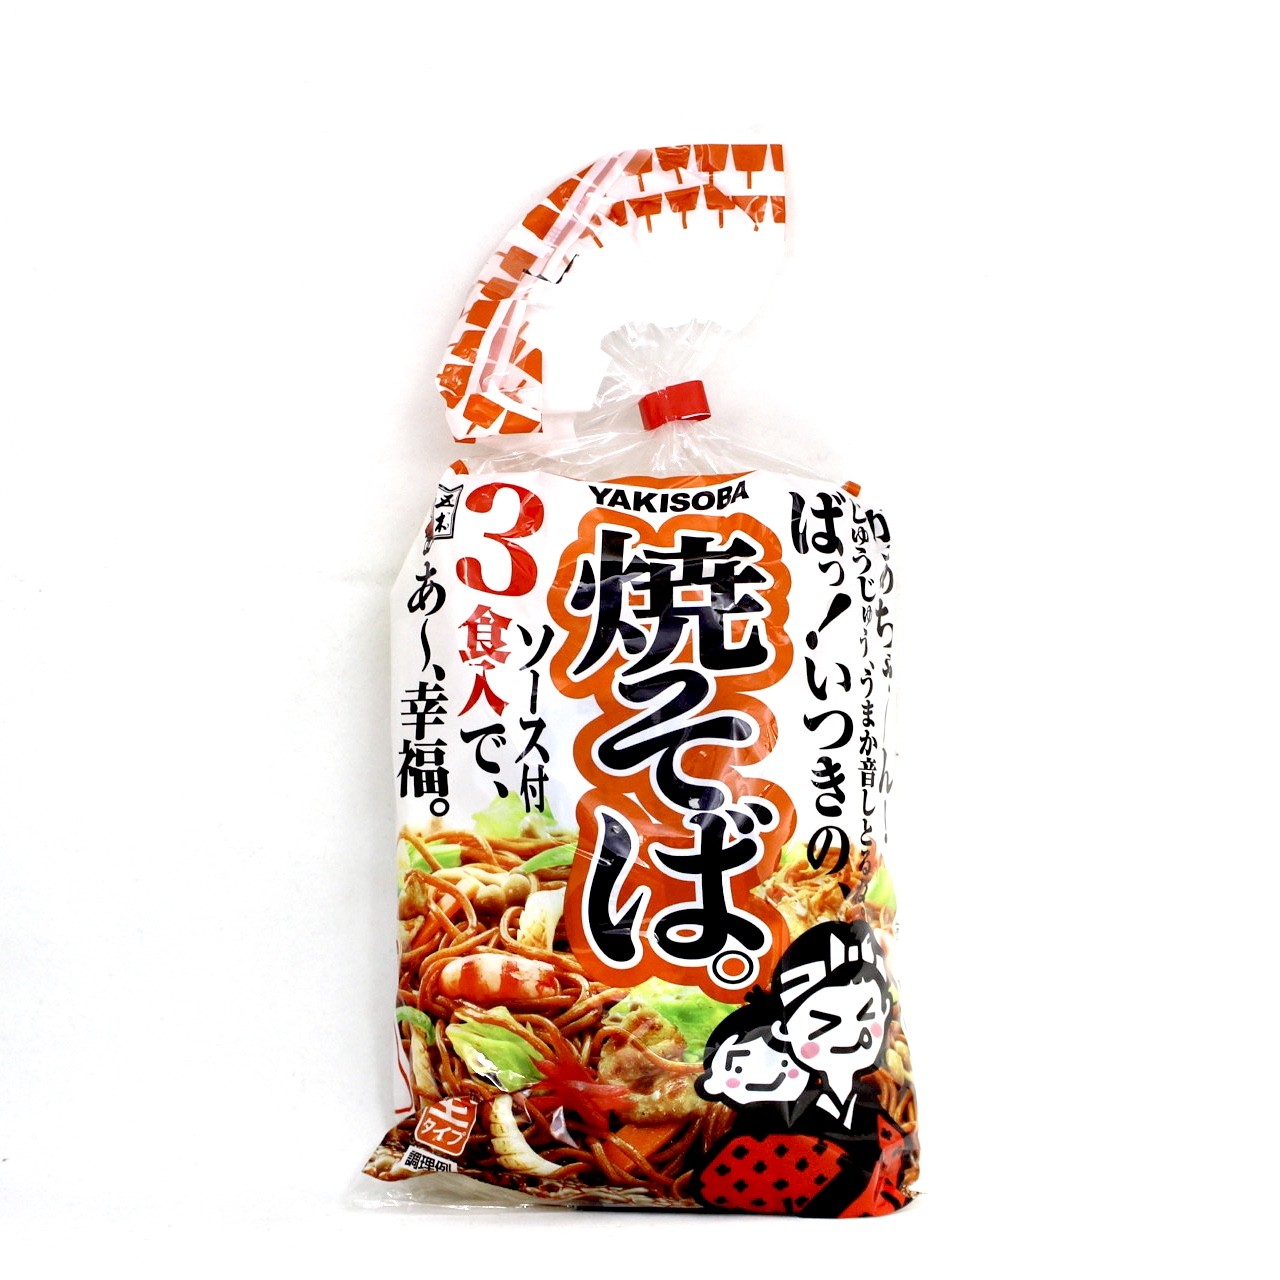 ITSUKI 3KO YAKISSOBA 510g